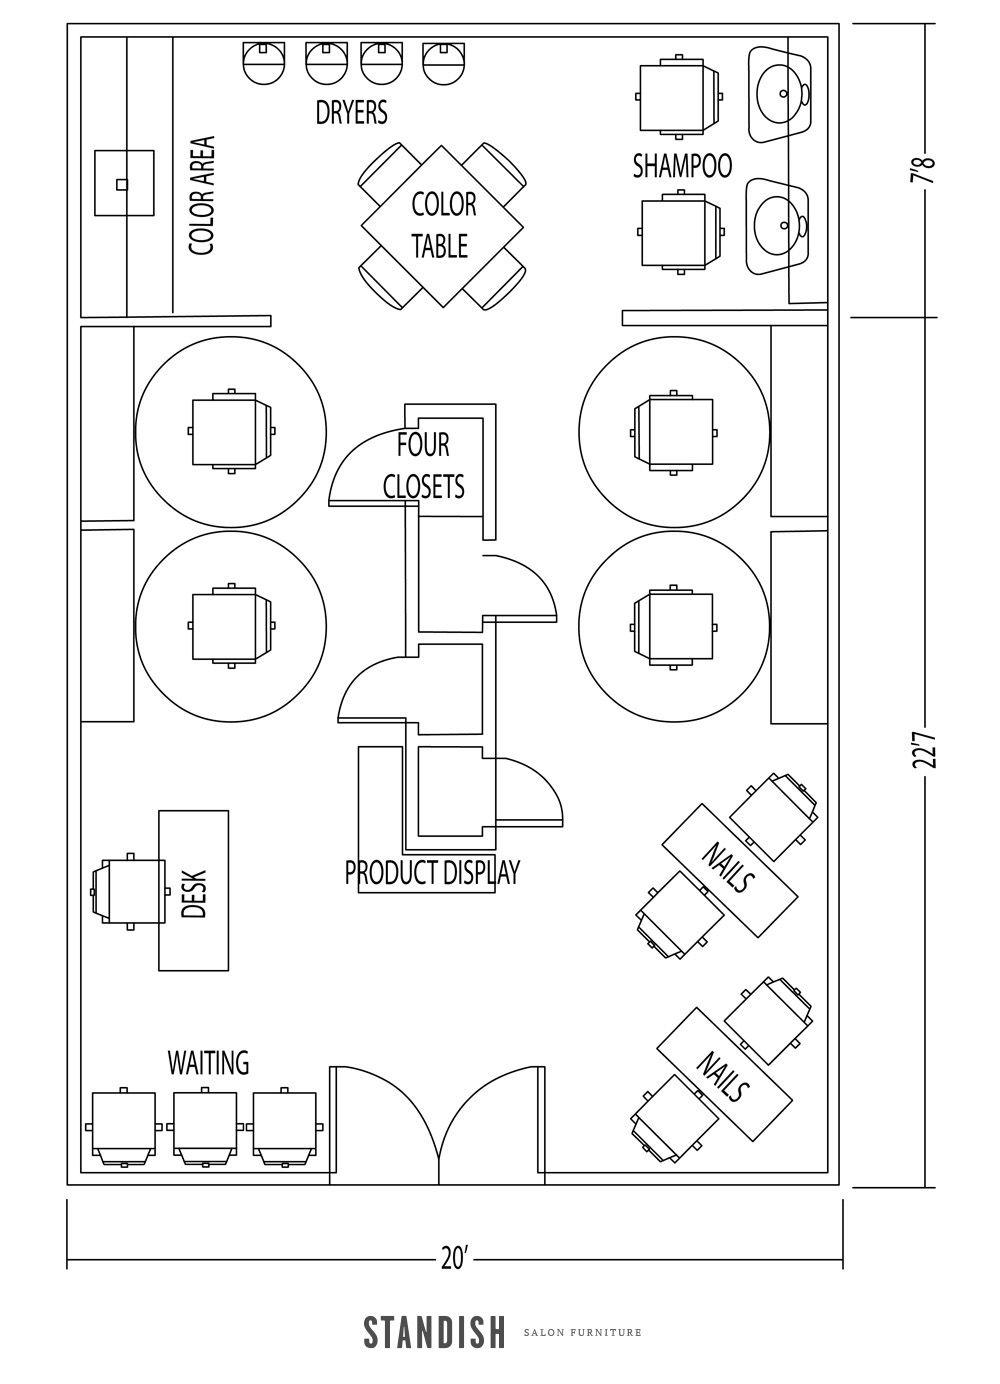 5 Amazing Salon Floor Plan Designs Hair Salon Design Beauty Salon Design Salon Design